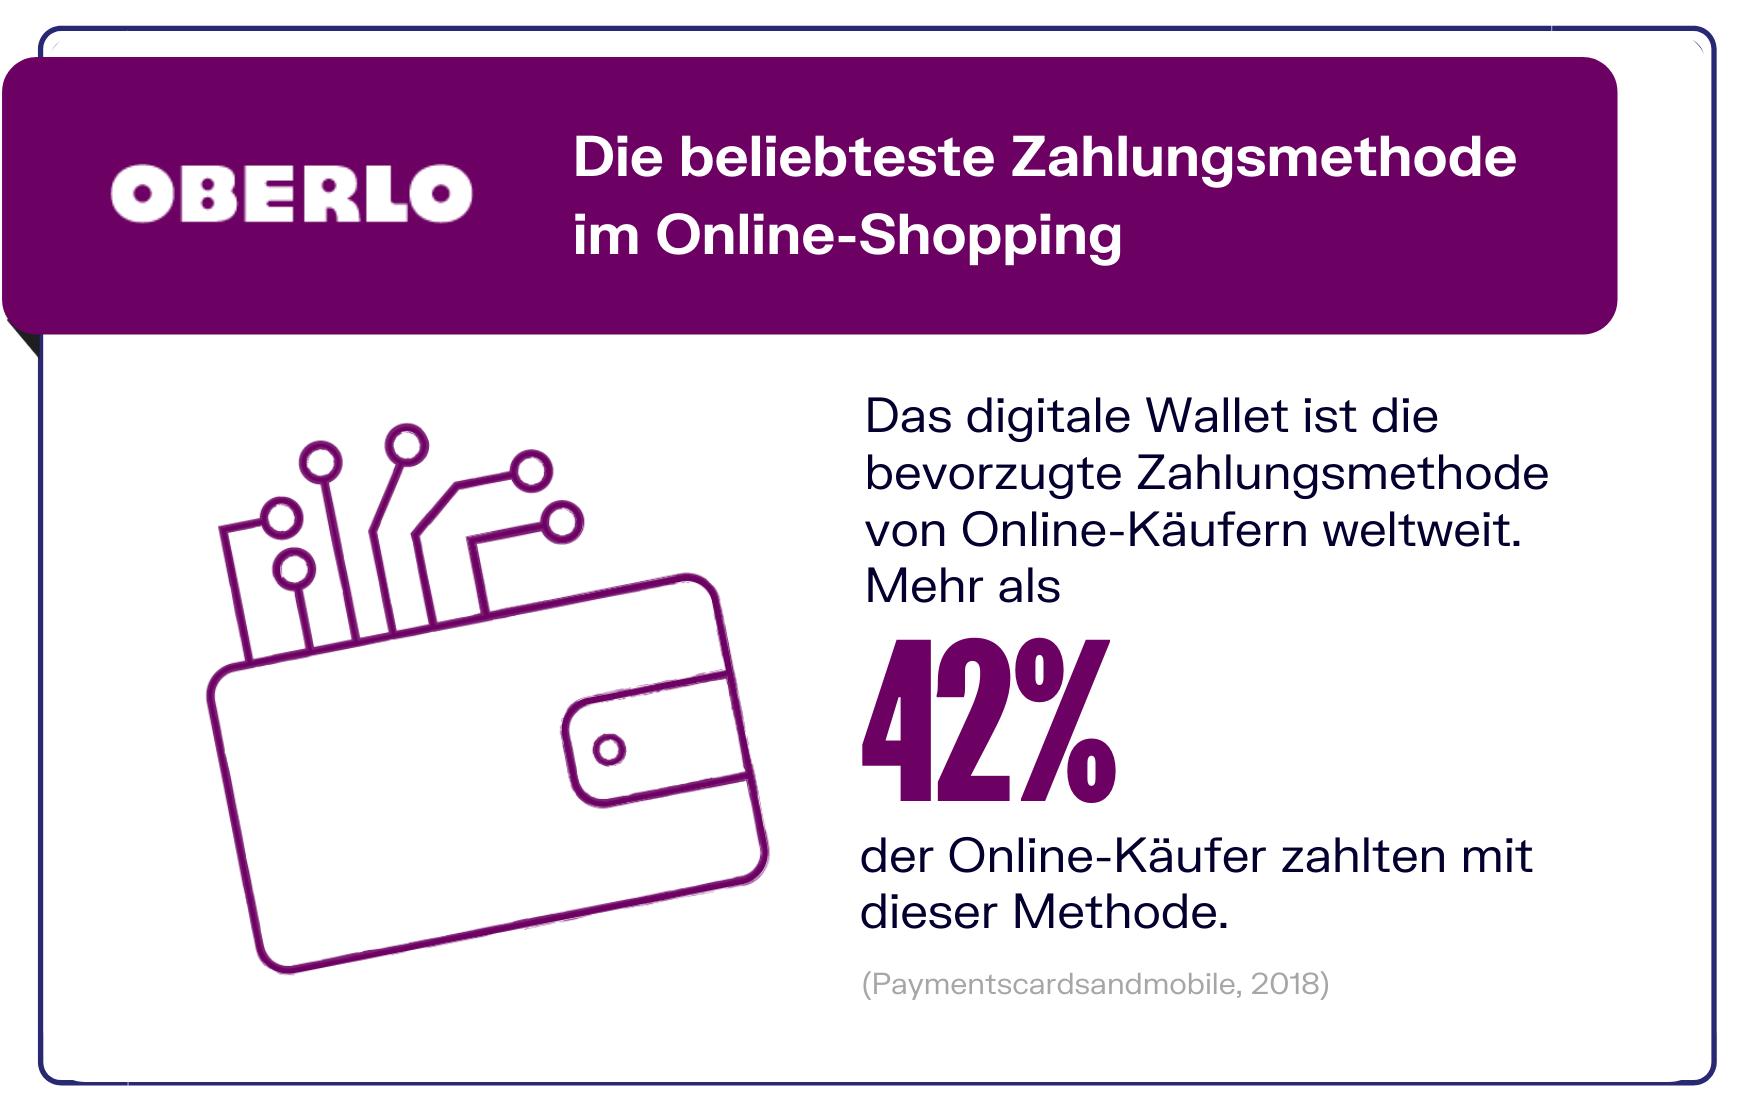 Digitale Wallets als Zahlungsmethode im E-Commerce